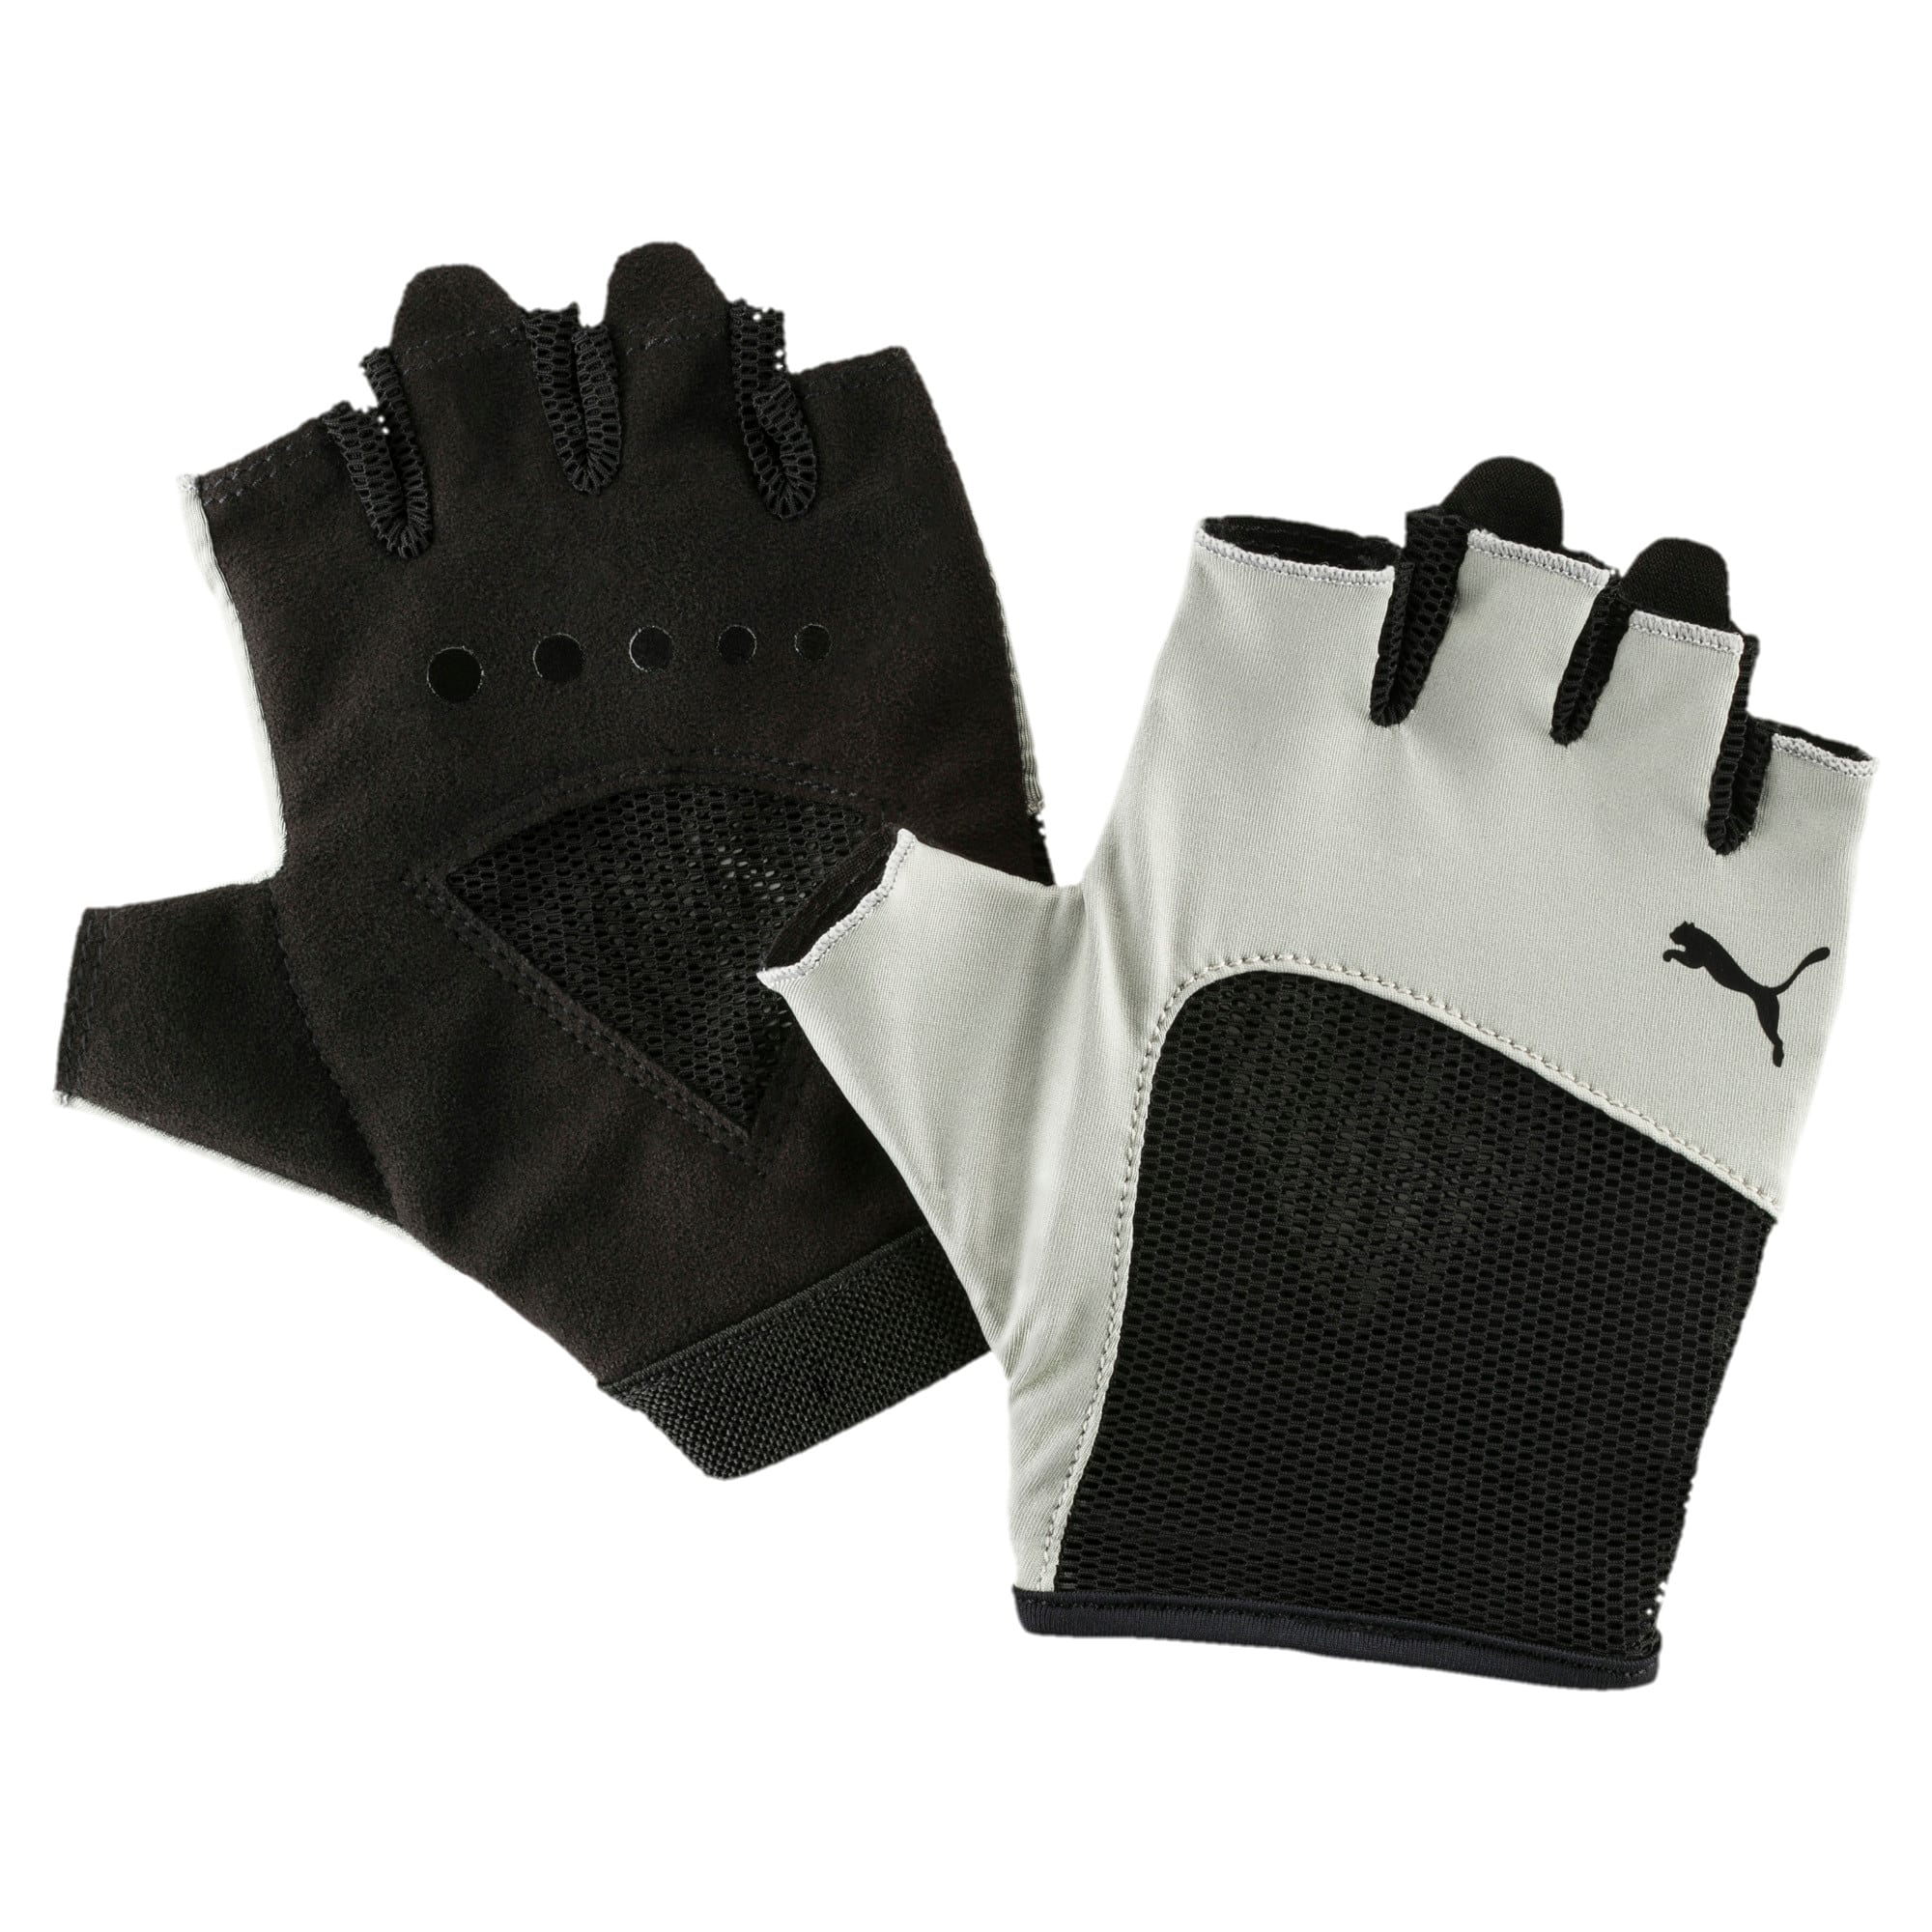 Thumbnail 1 of Gym Women's Gloves, Rock Ridge-Puma Black, medium-IND